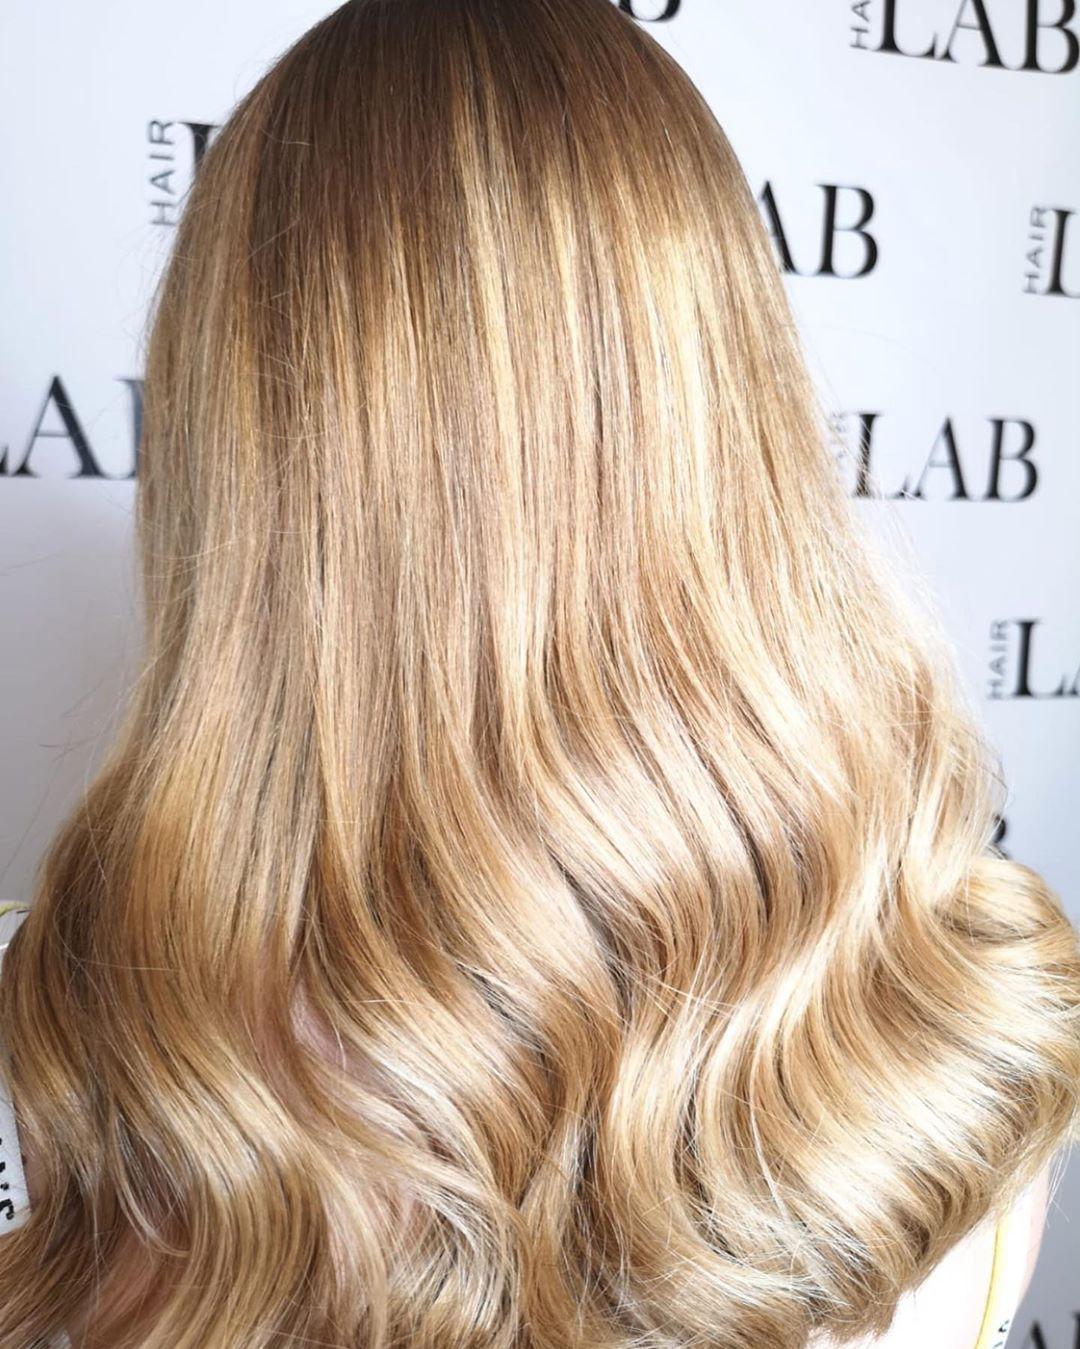 Hair Transformations Following Lockdown